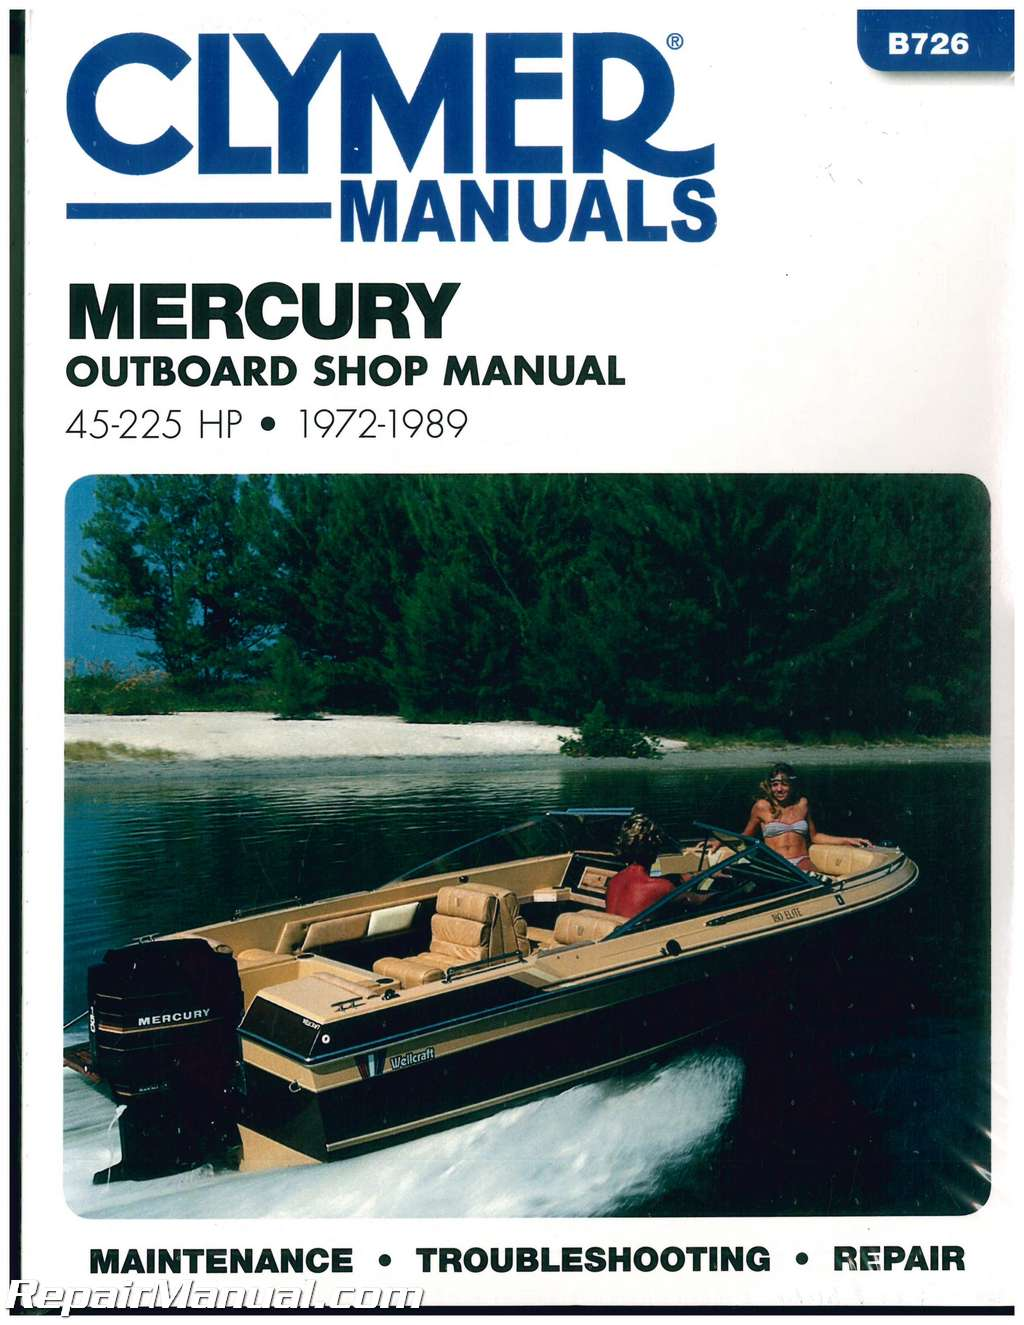 fuel filter mercury 700 thunderbolt wiring diagram Waverunner Fuel Filter 1972 1989 mercury 45 225 hp clymer outboard boat engine repair manual fuel filter mercury 700 thunderbolt